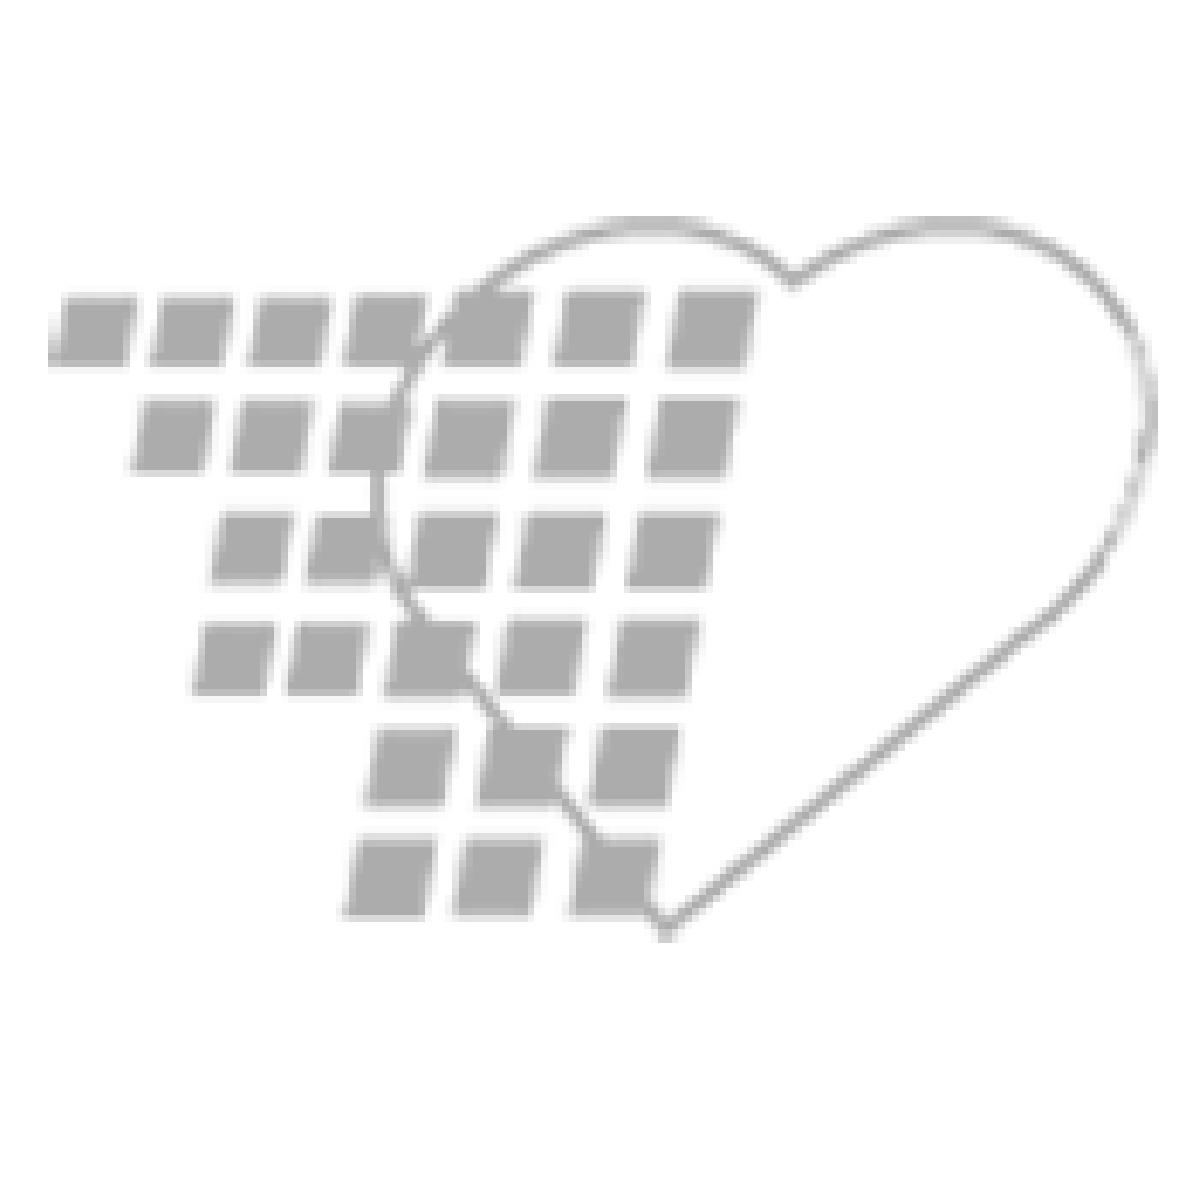 06-93-9009 - Demo Dose® Pfizerpn (Pencilln G) 10 mL 20,000,000 units/Vial